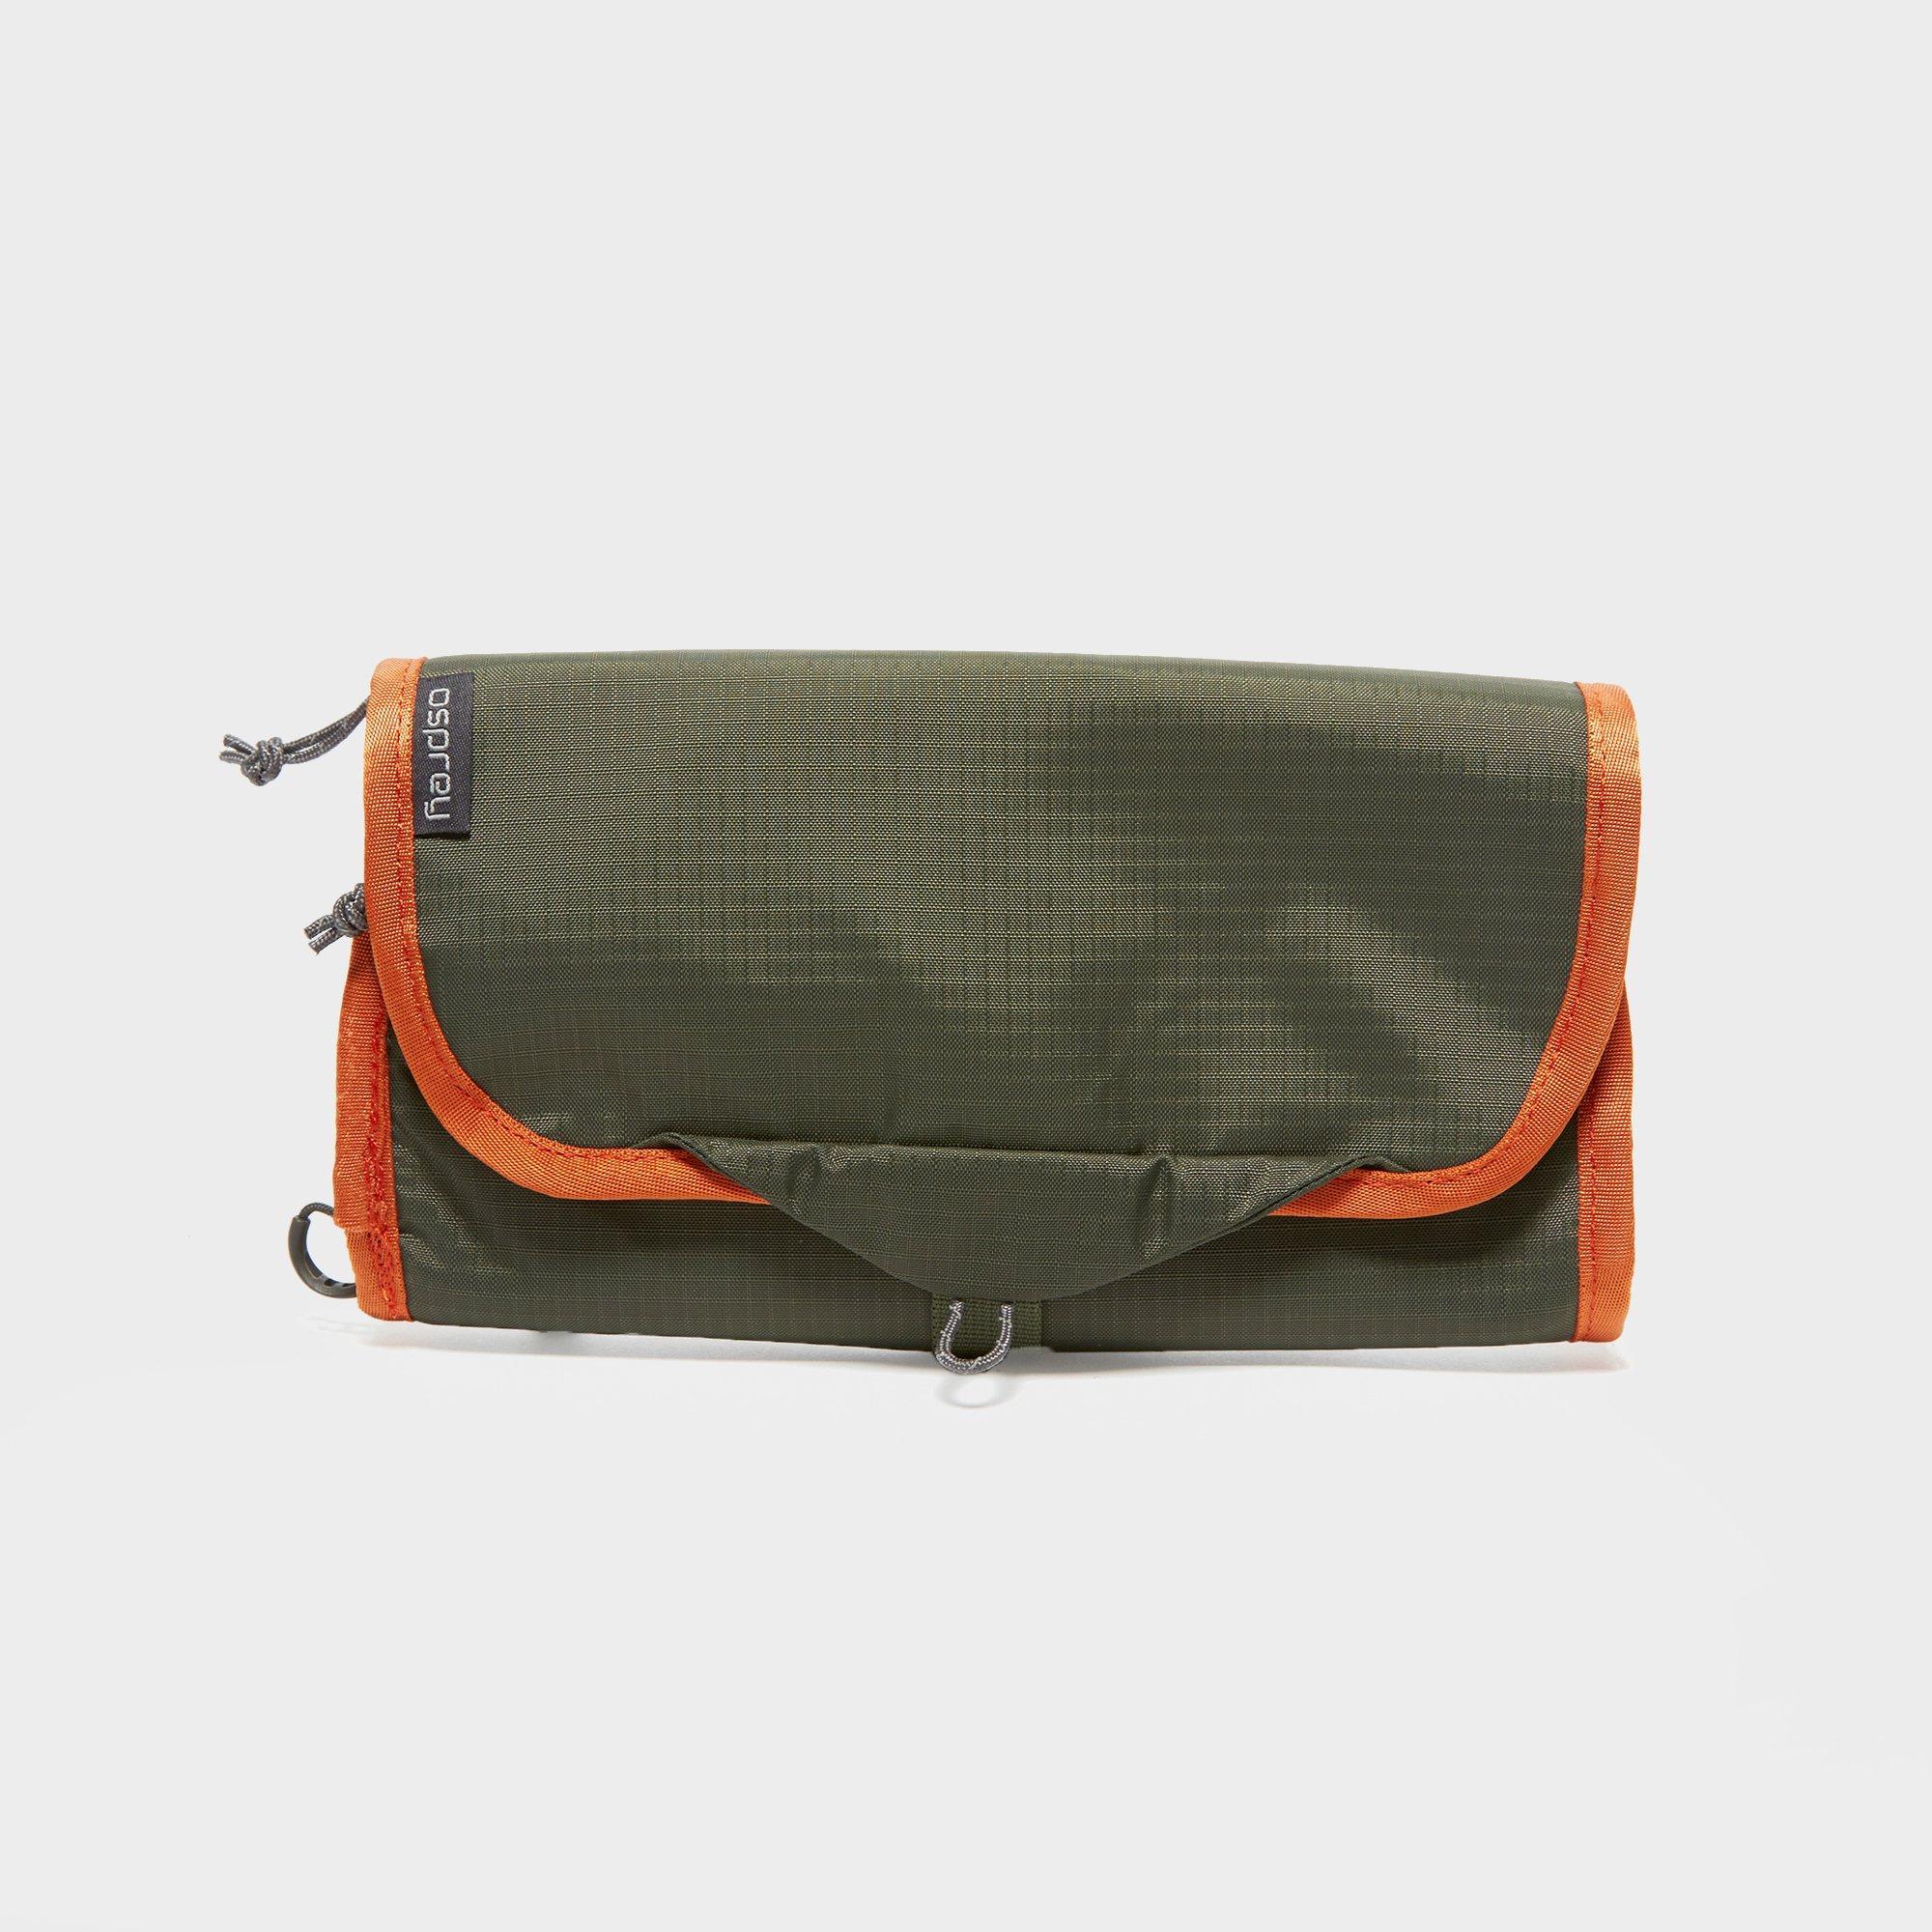 Vango F10 Xenon Ul 2+ Backpacking Tent